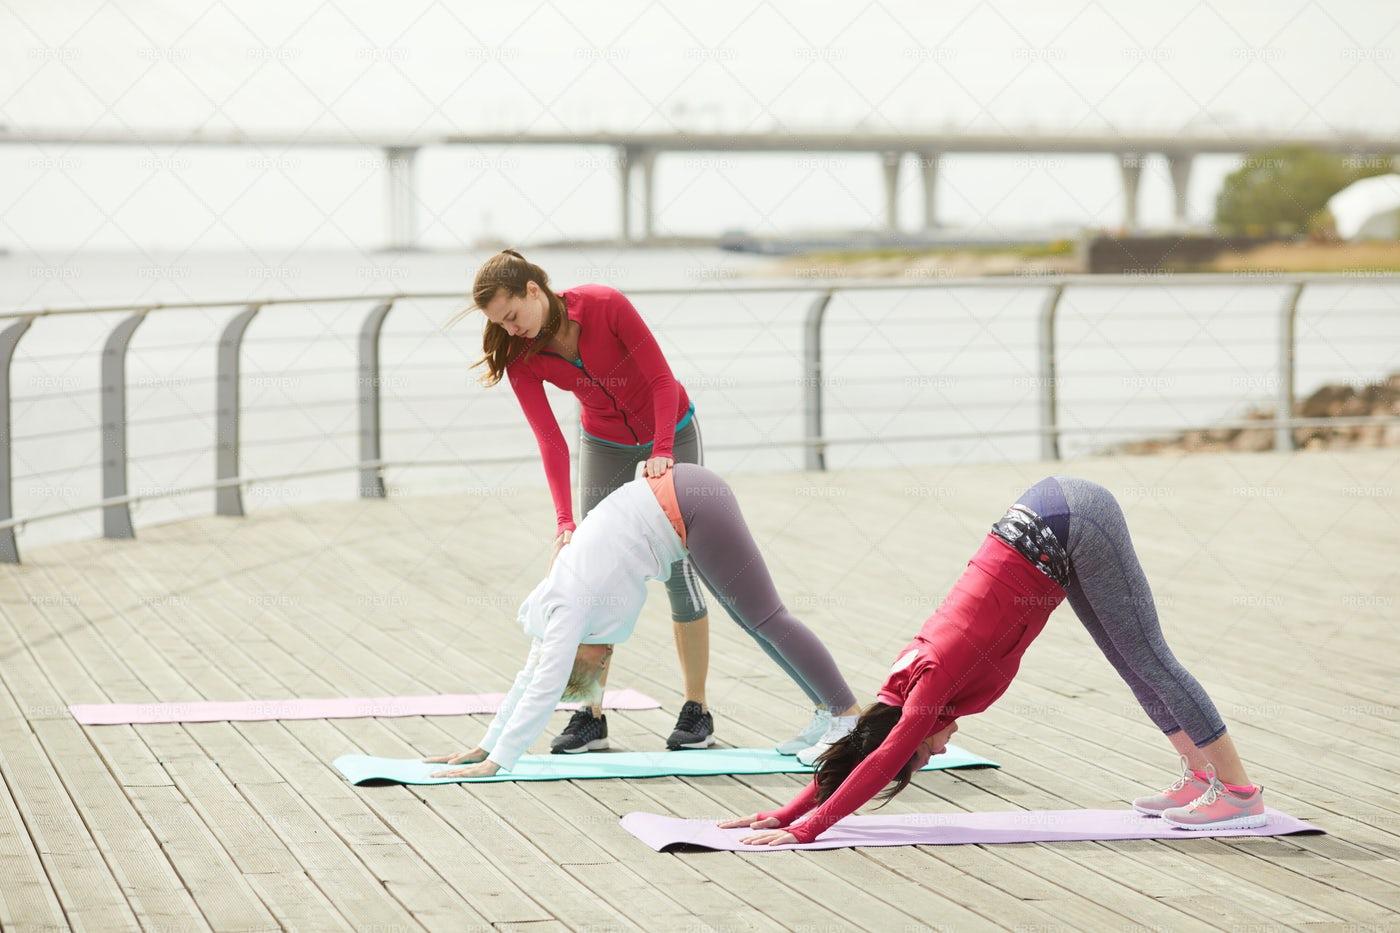 Morning Yoga Class Outdoors: Stock Photos